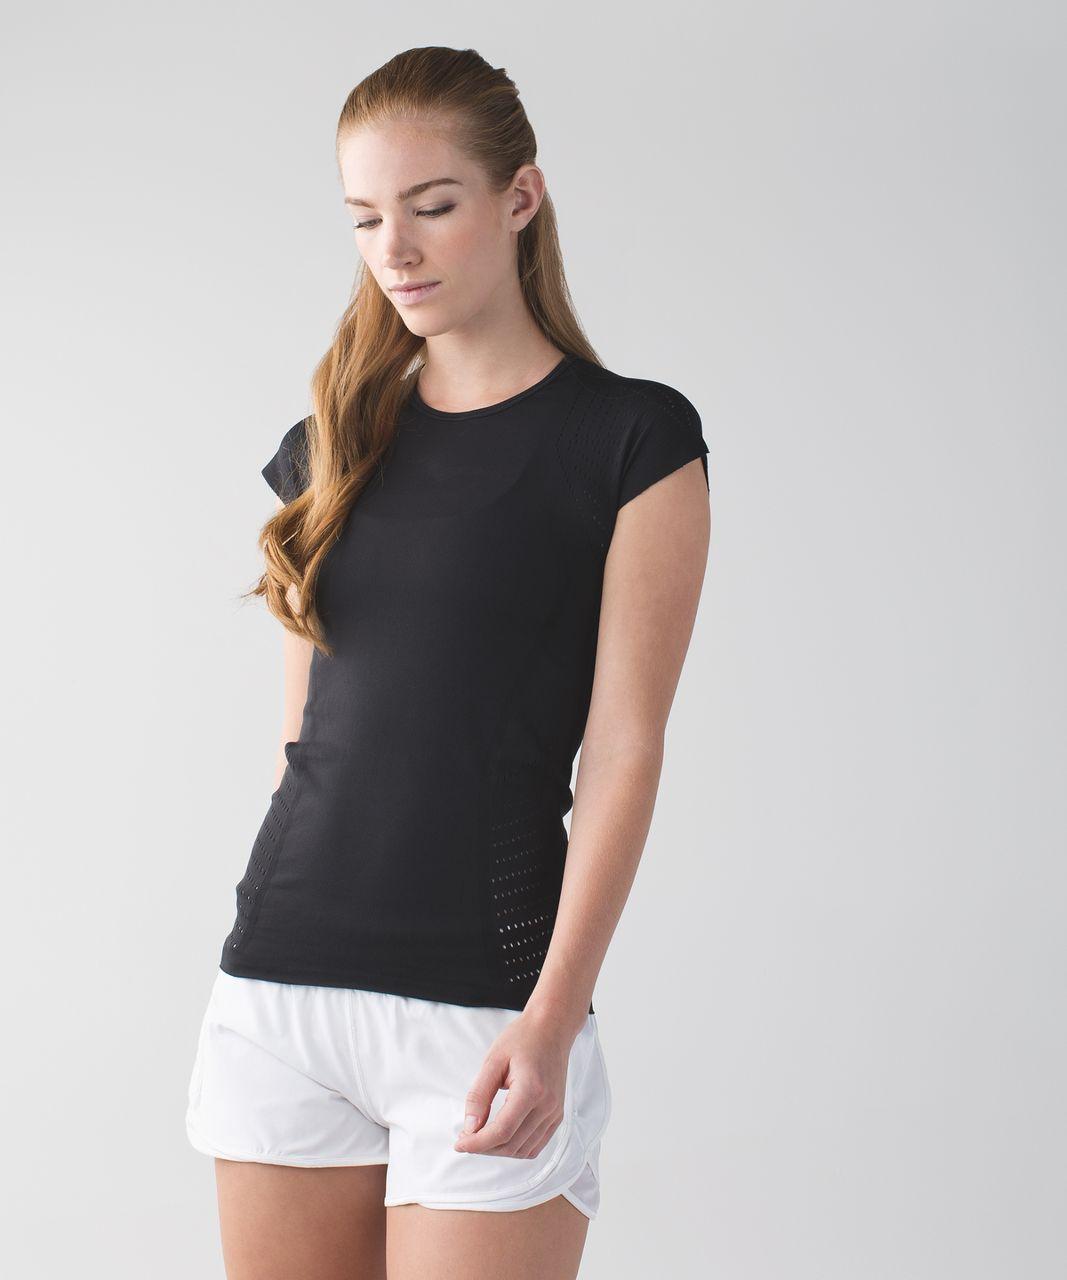 Lululemon Time Warp Short Sleeve - Black